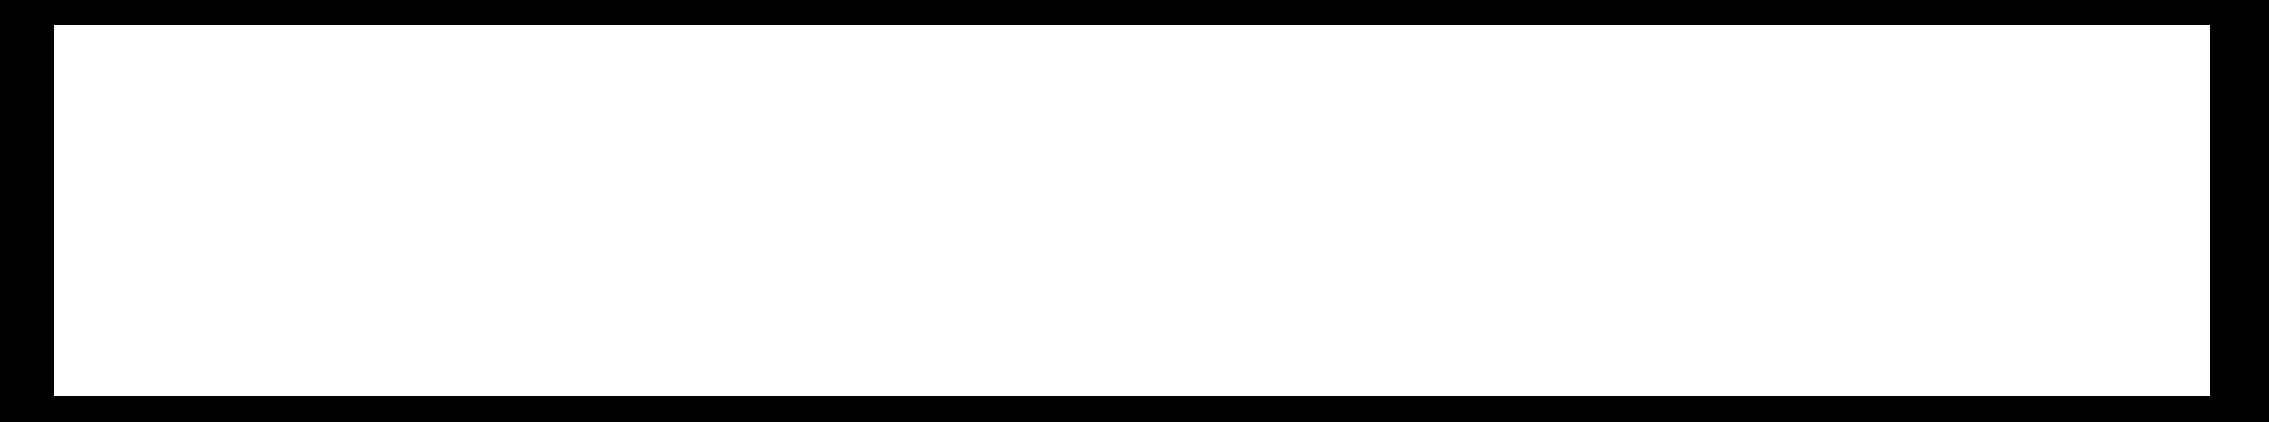 AmenaCore Type